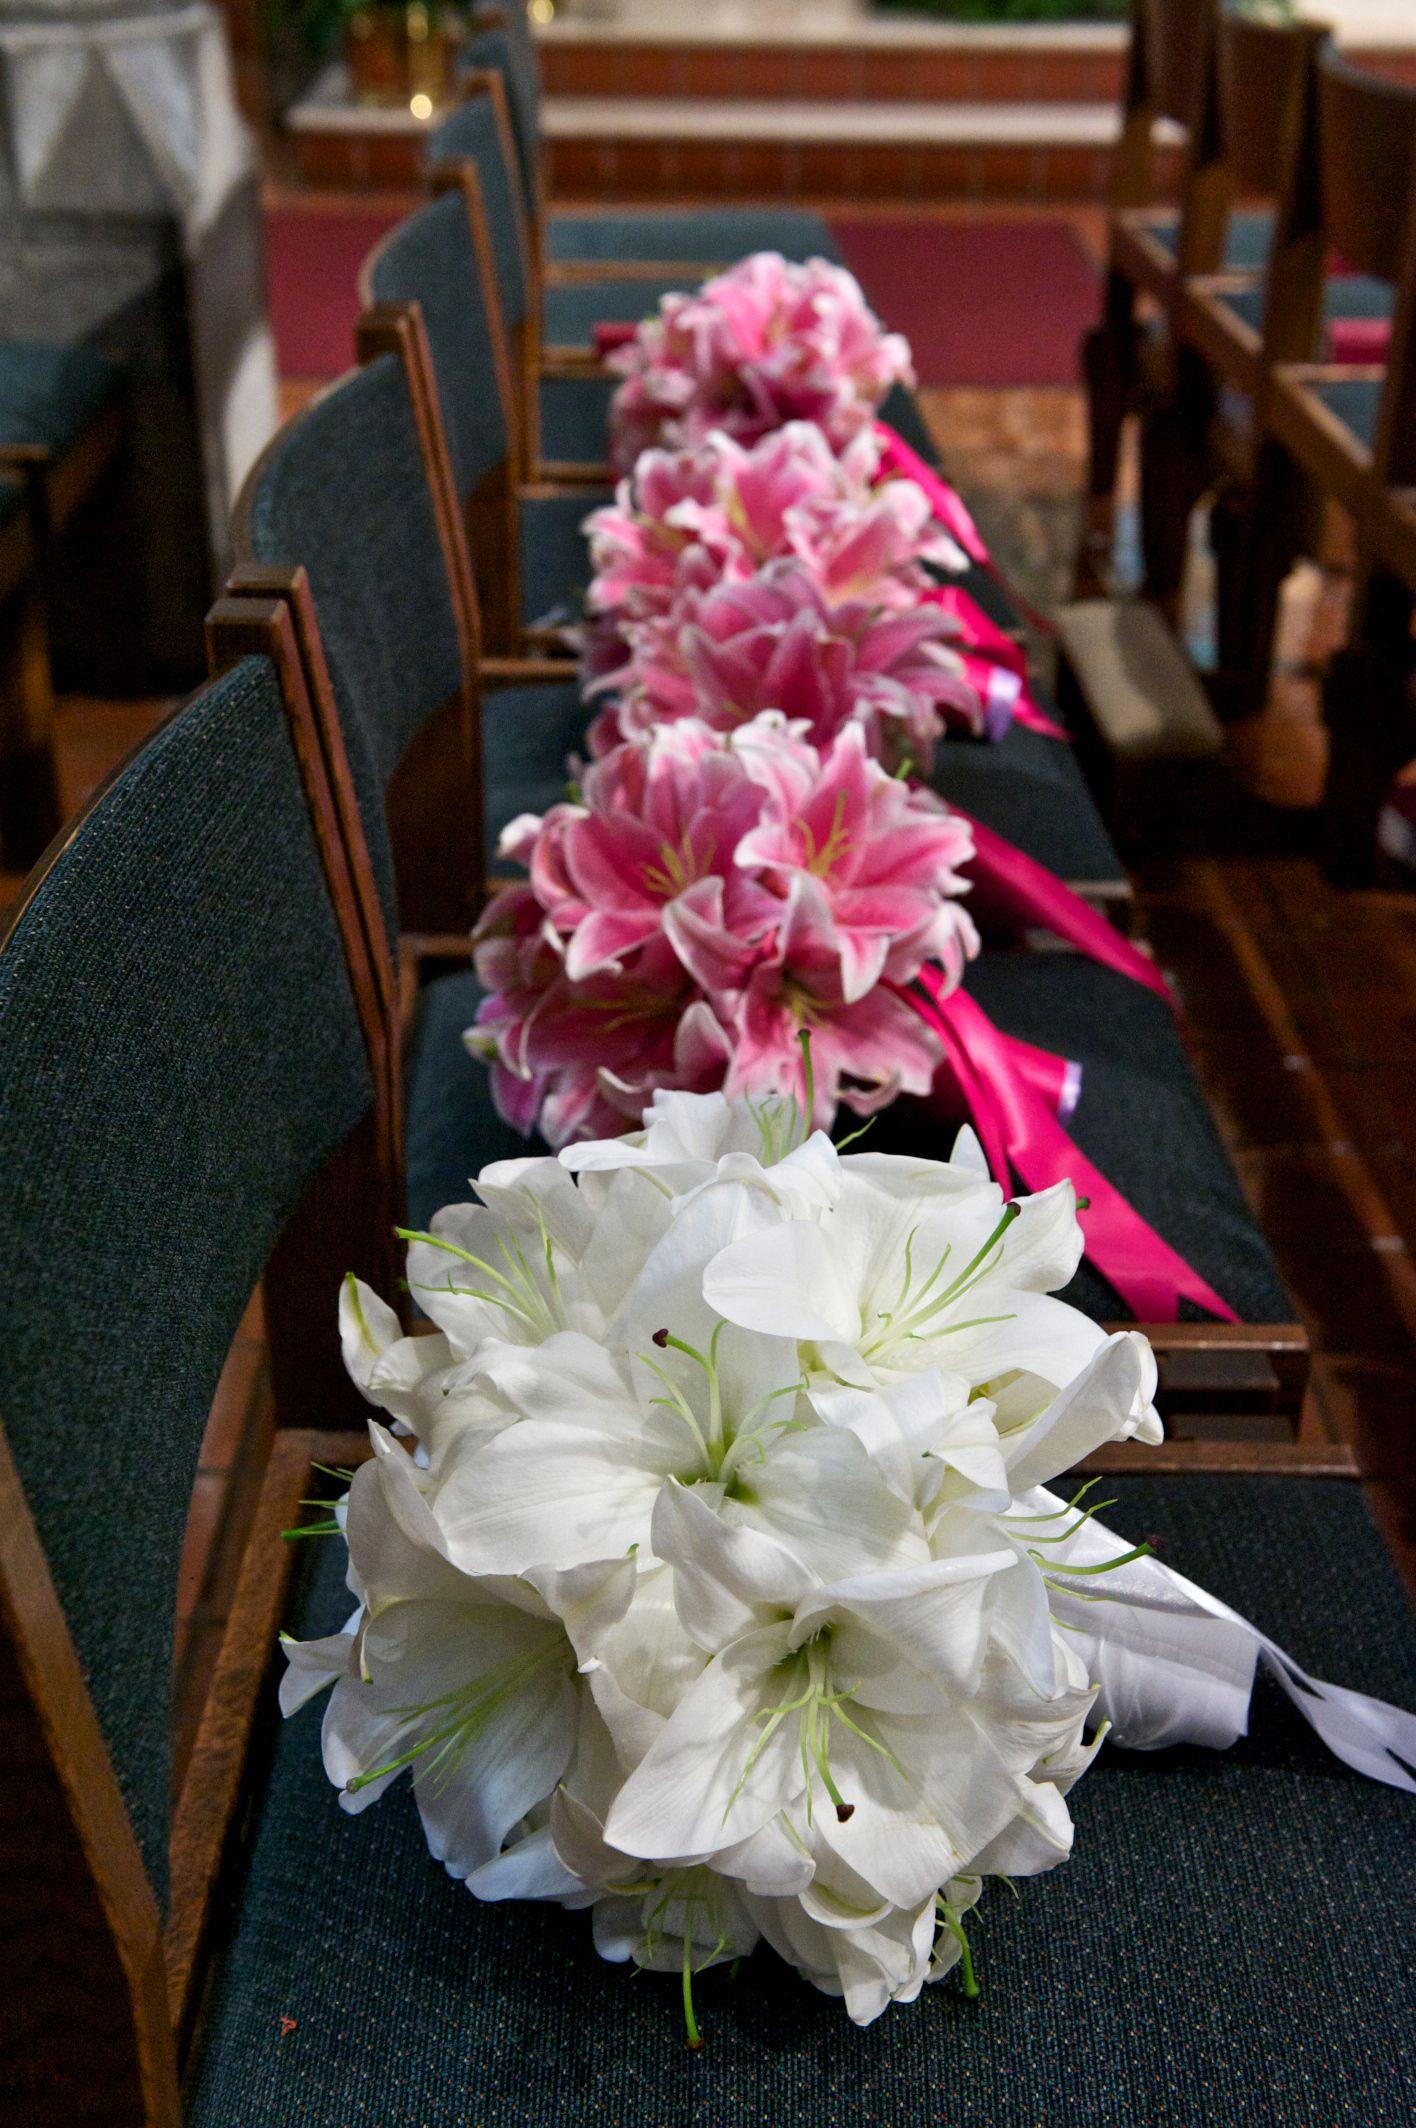 Lilylily pretty lily bridal bouquets pinterest wedding lilylily pretty lily stargazer lily bouquet stargazer lily wedding white lily bouquet izmirmasajfo